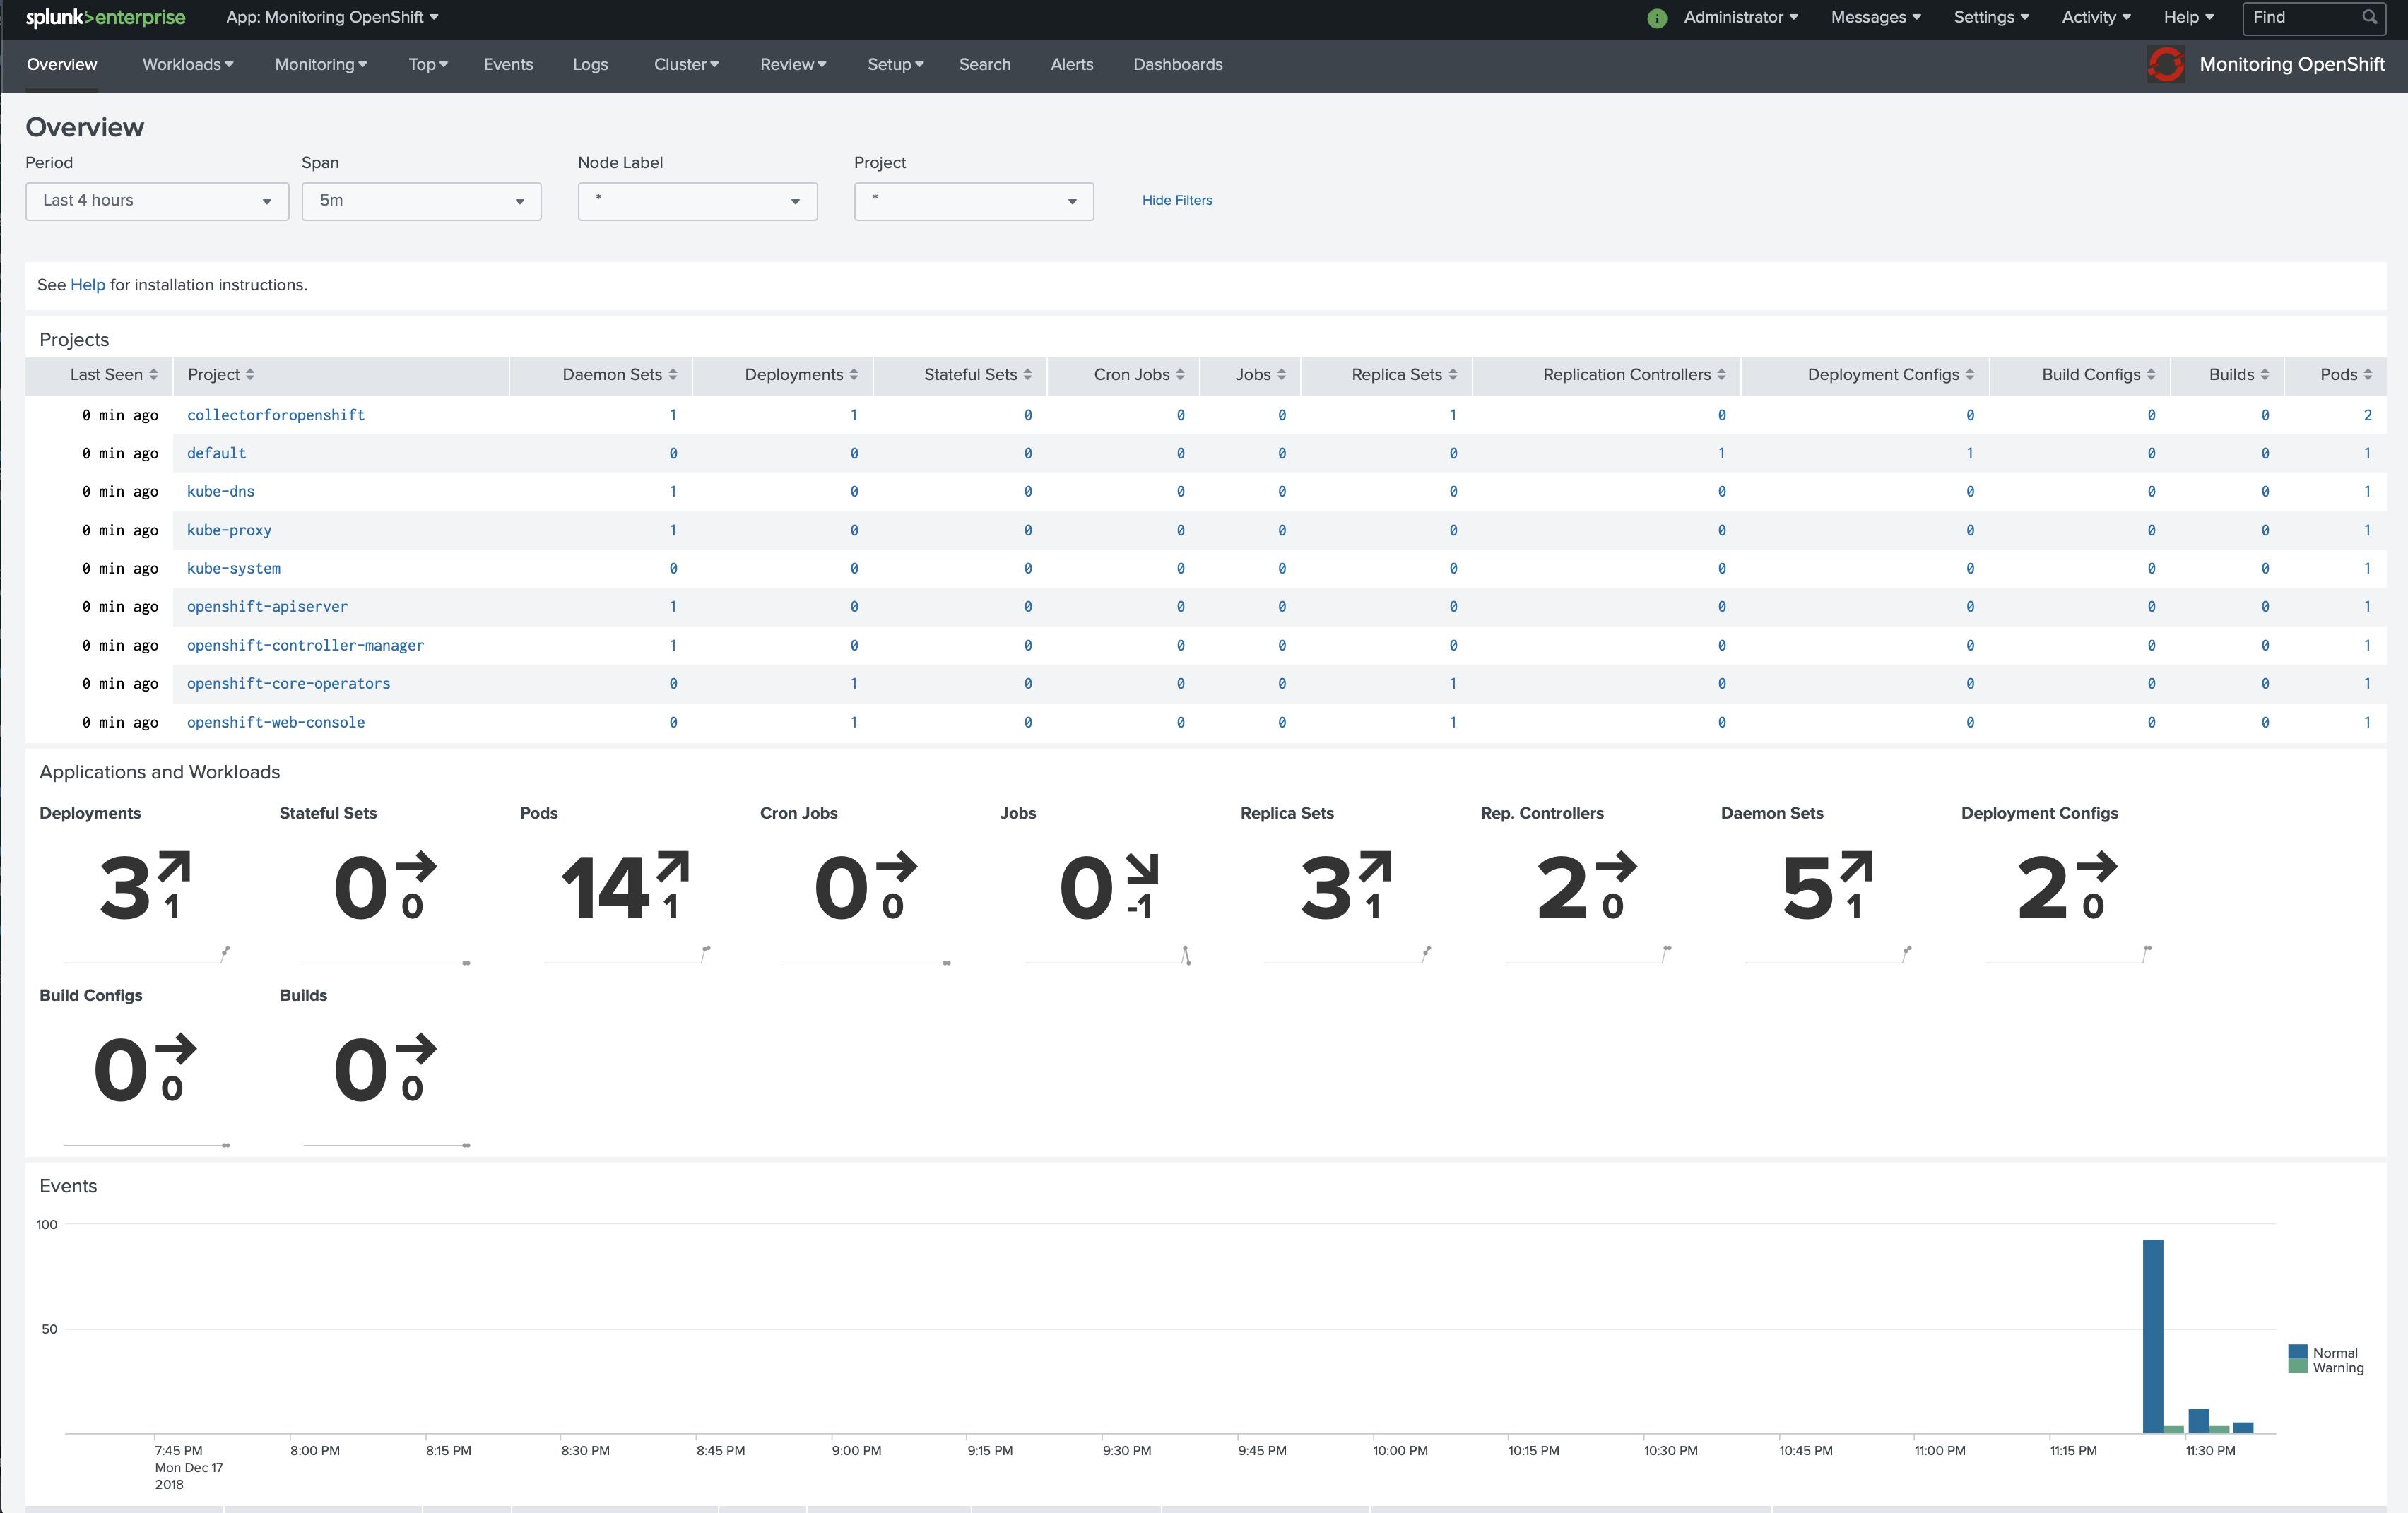 Monitoring OpenShift